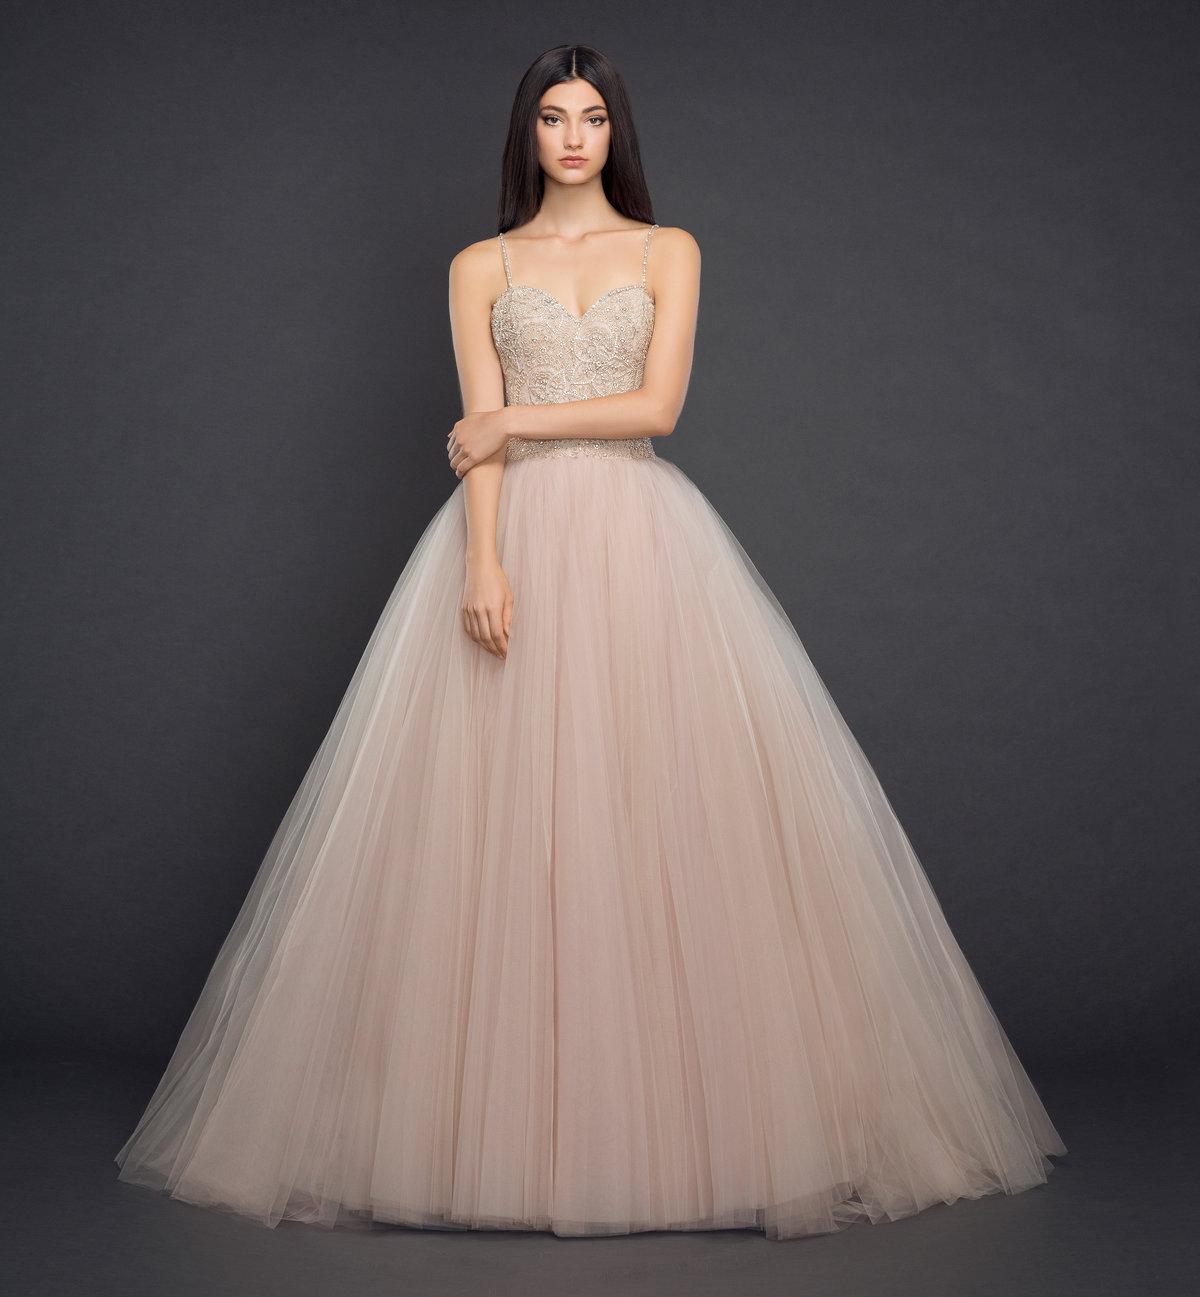 Lazaro Wedding Dress And Bridal Gown Collection: Bridal Gowns And Wedding Dresses By JLM Couture